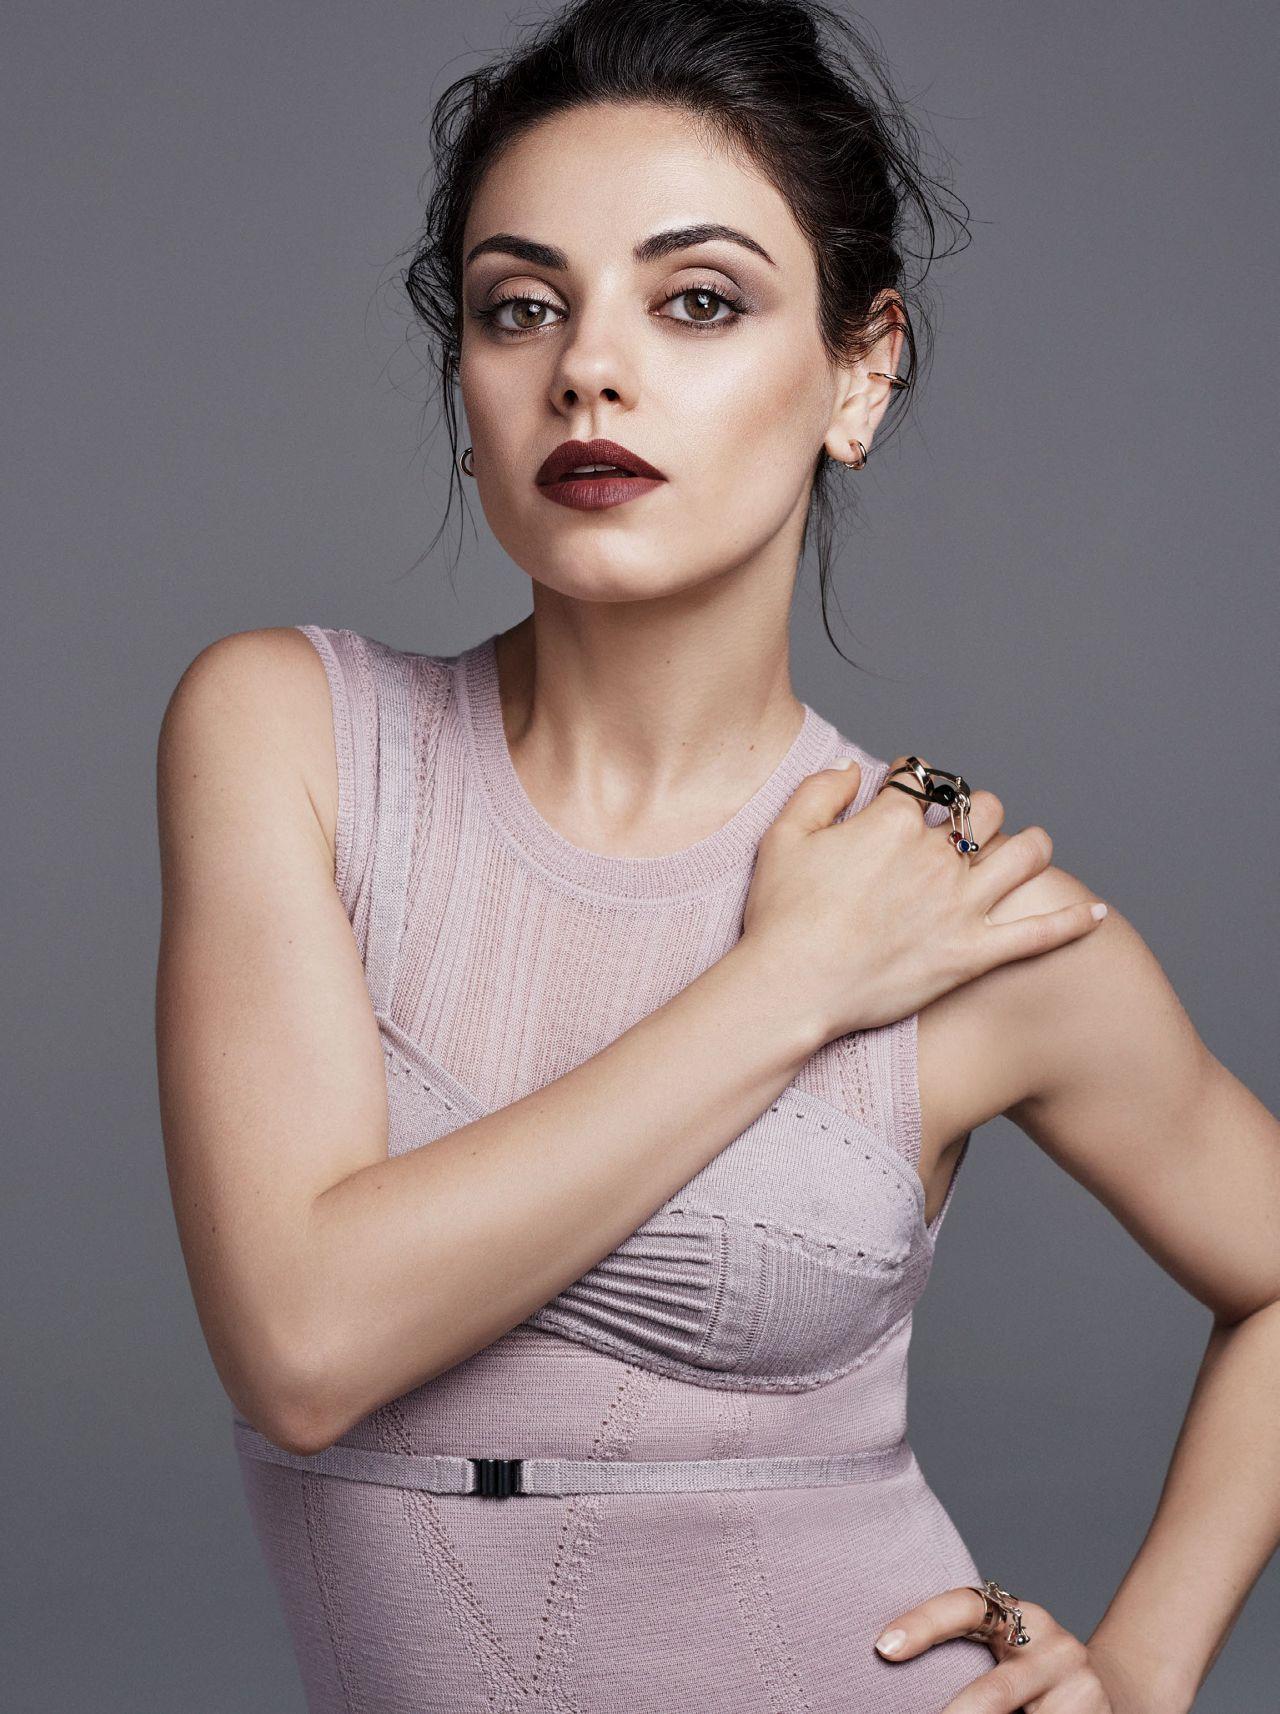 Mila Kunis - Photoshoot for US Glamour August 2016 Mila Kunis